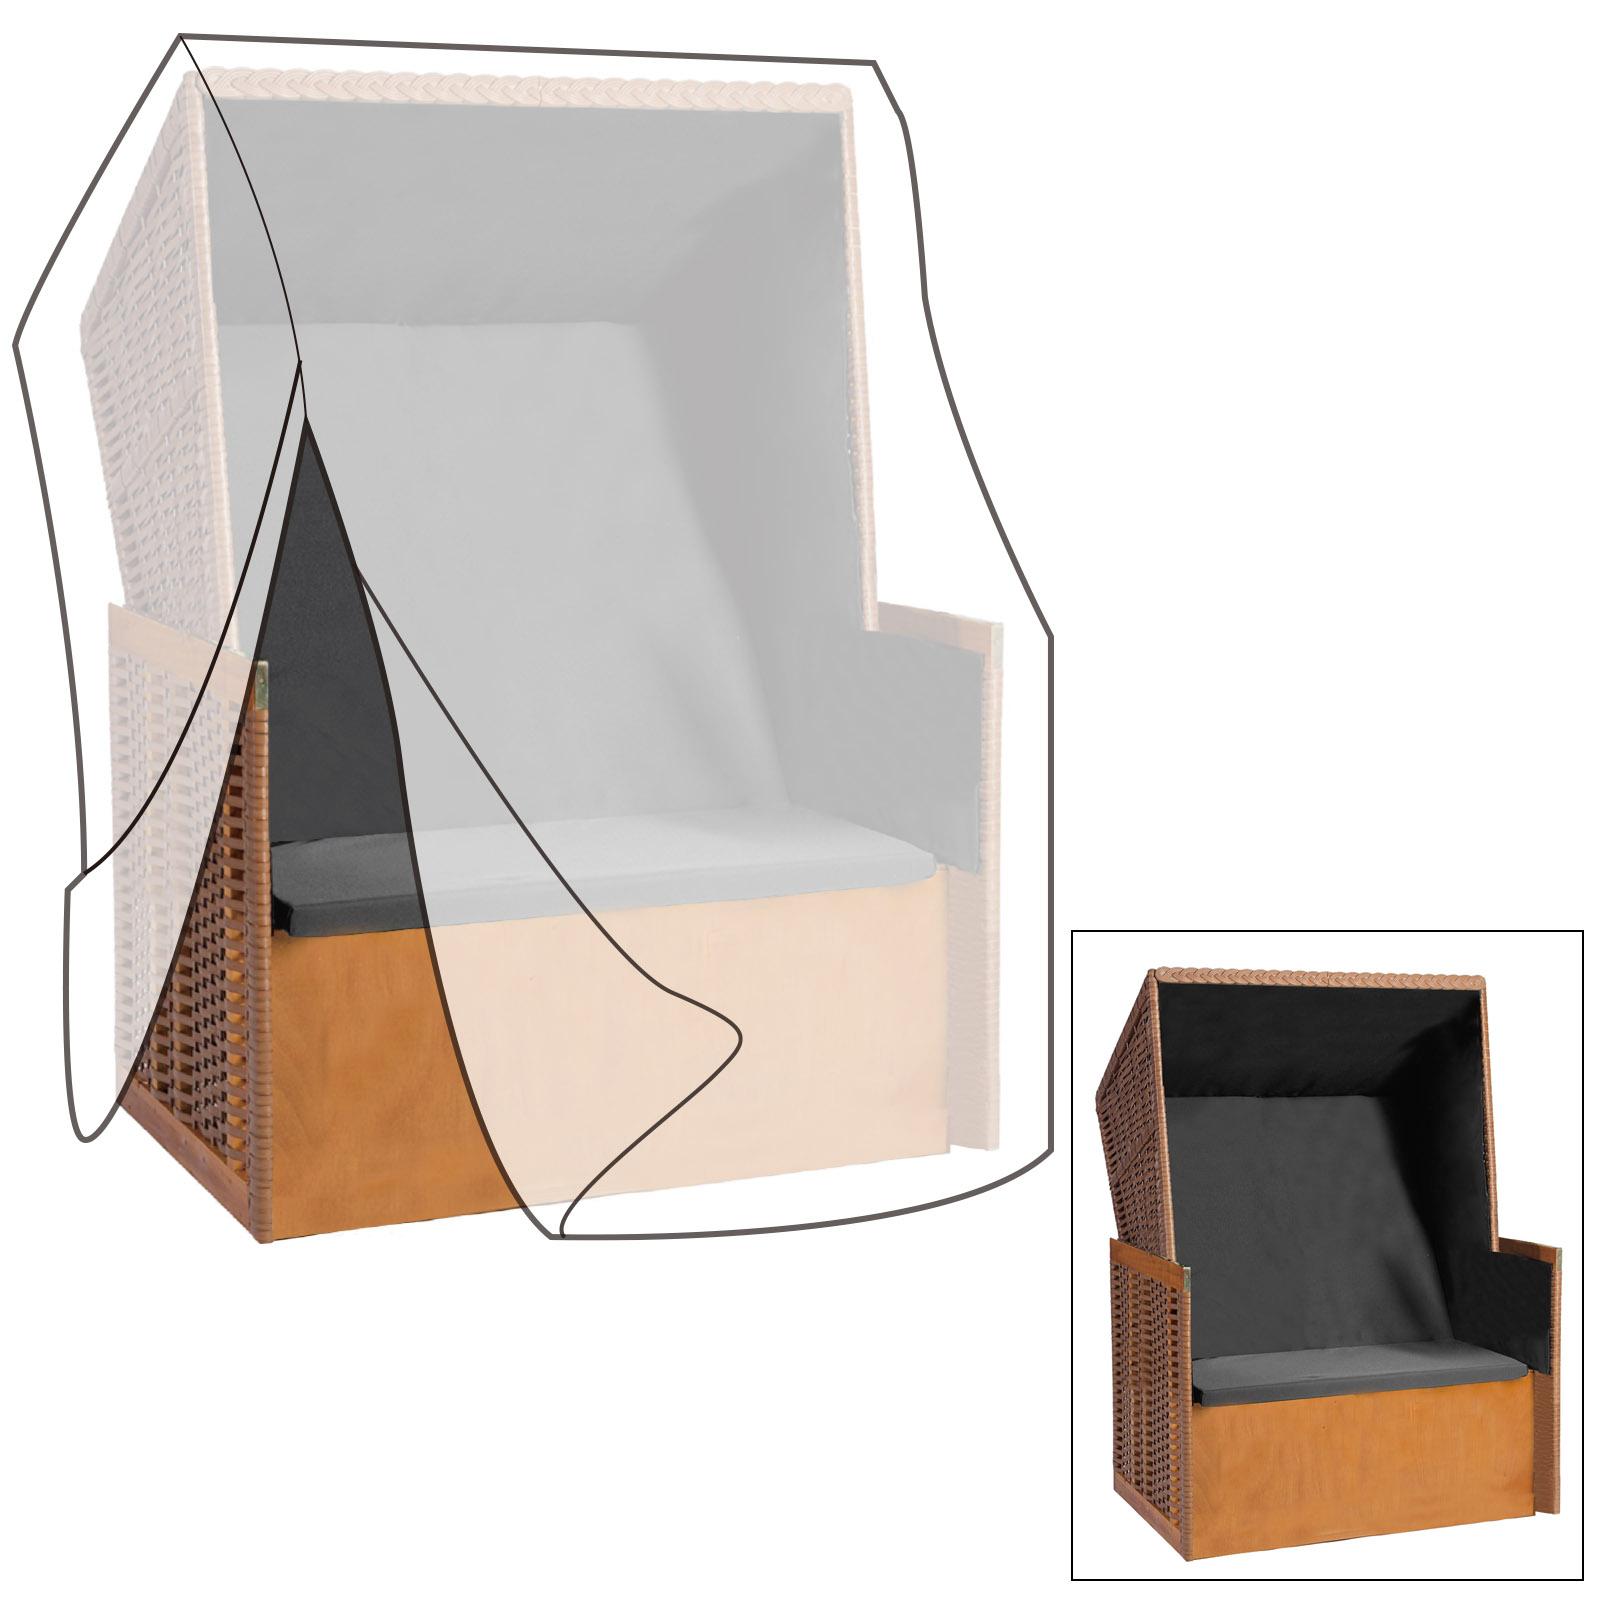 schutzh lle f r strandkorb schutzplane abdeckhaube h lle transparent gz1160tp ebay. Black Bedroom Furniture Sets. Home Design Ideas